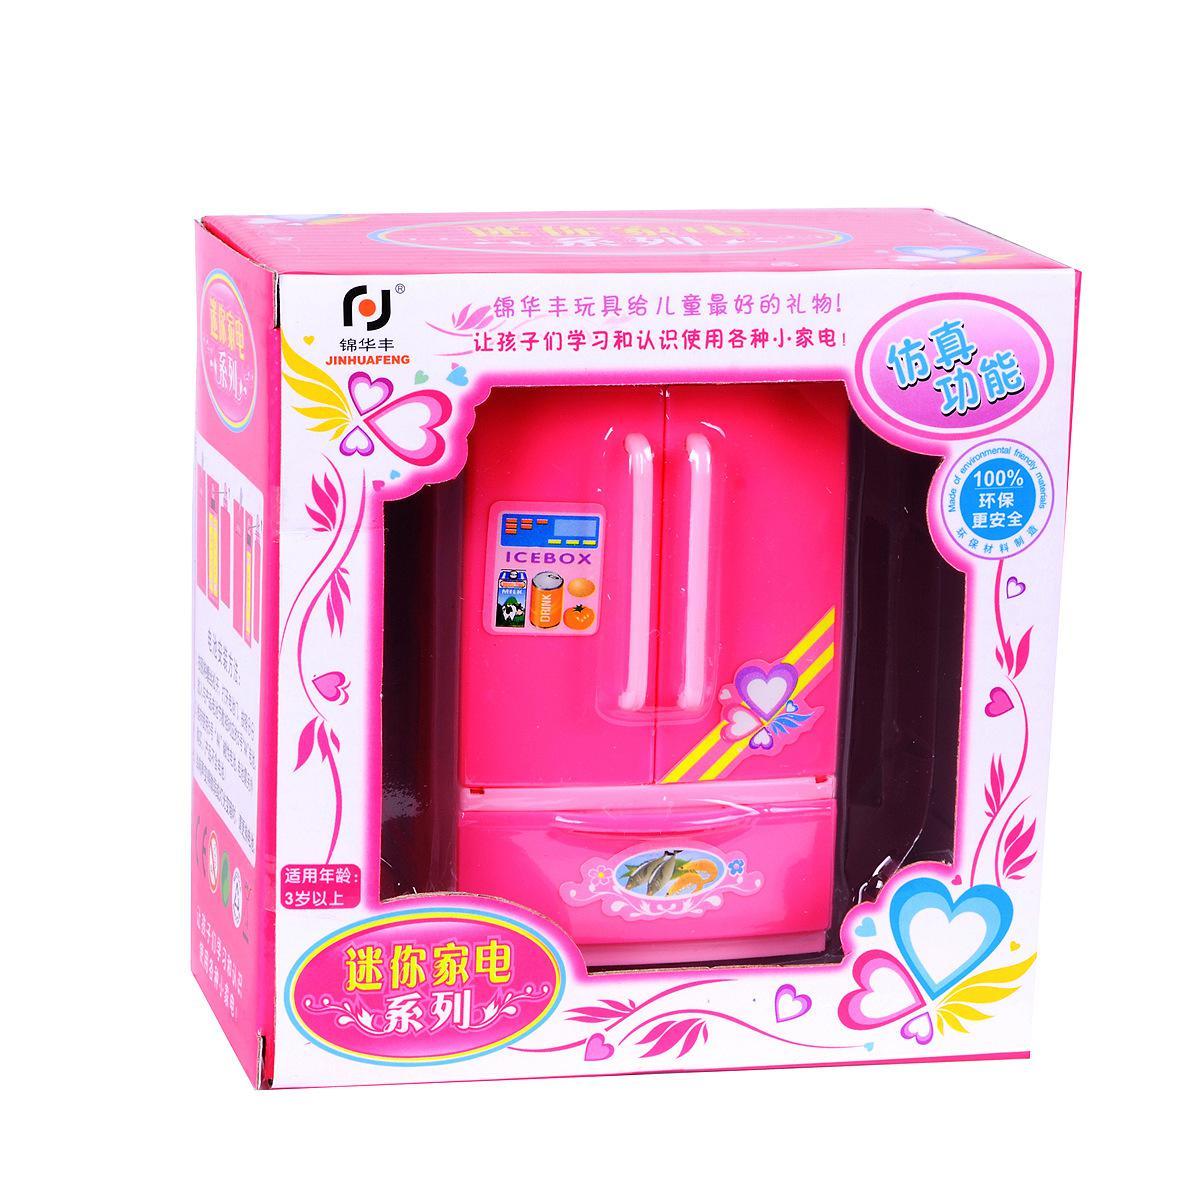 Dream Kitchen Toy Refrigerator: Online Buy Wholesale Toy Refrigerator From China Toy Refrigerator Wholesalers